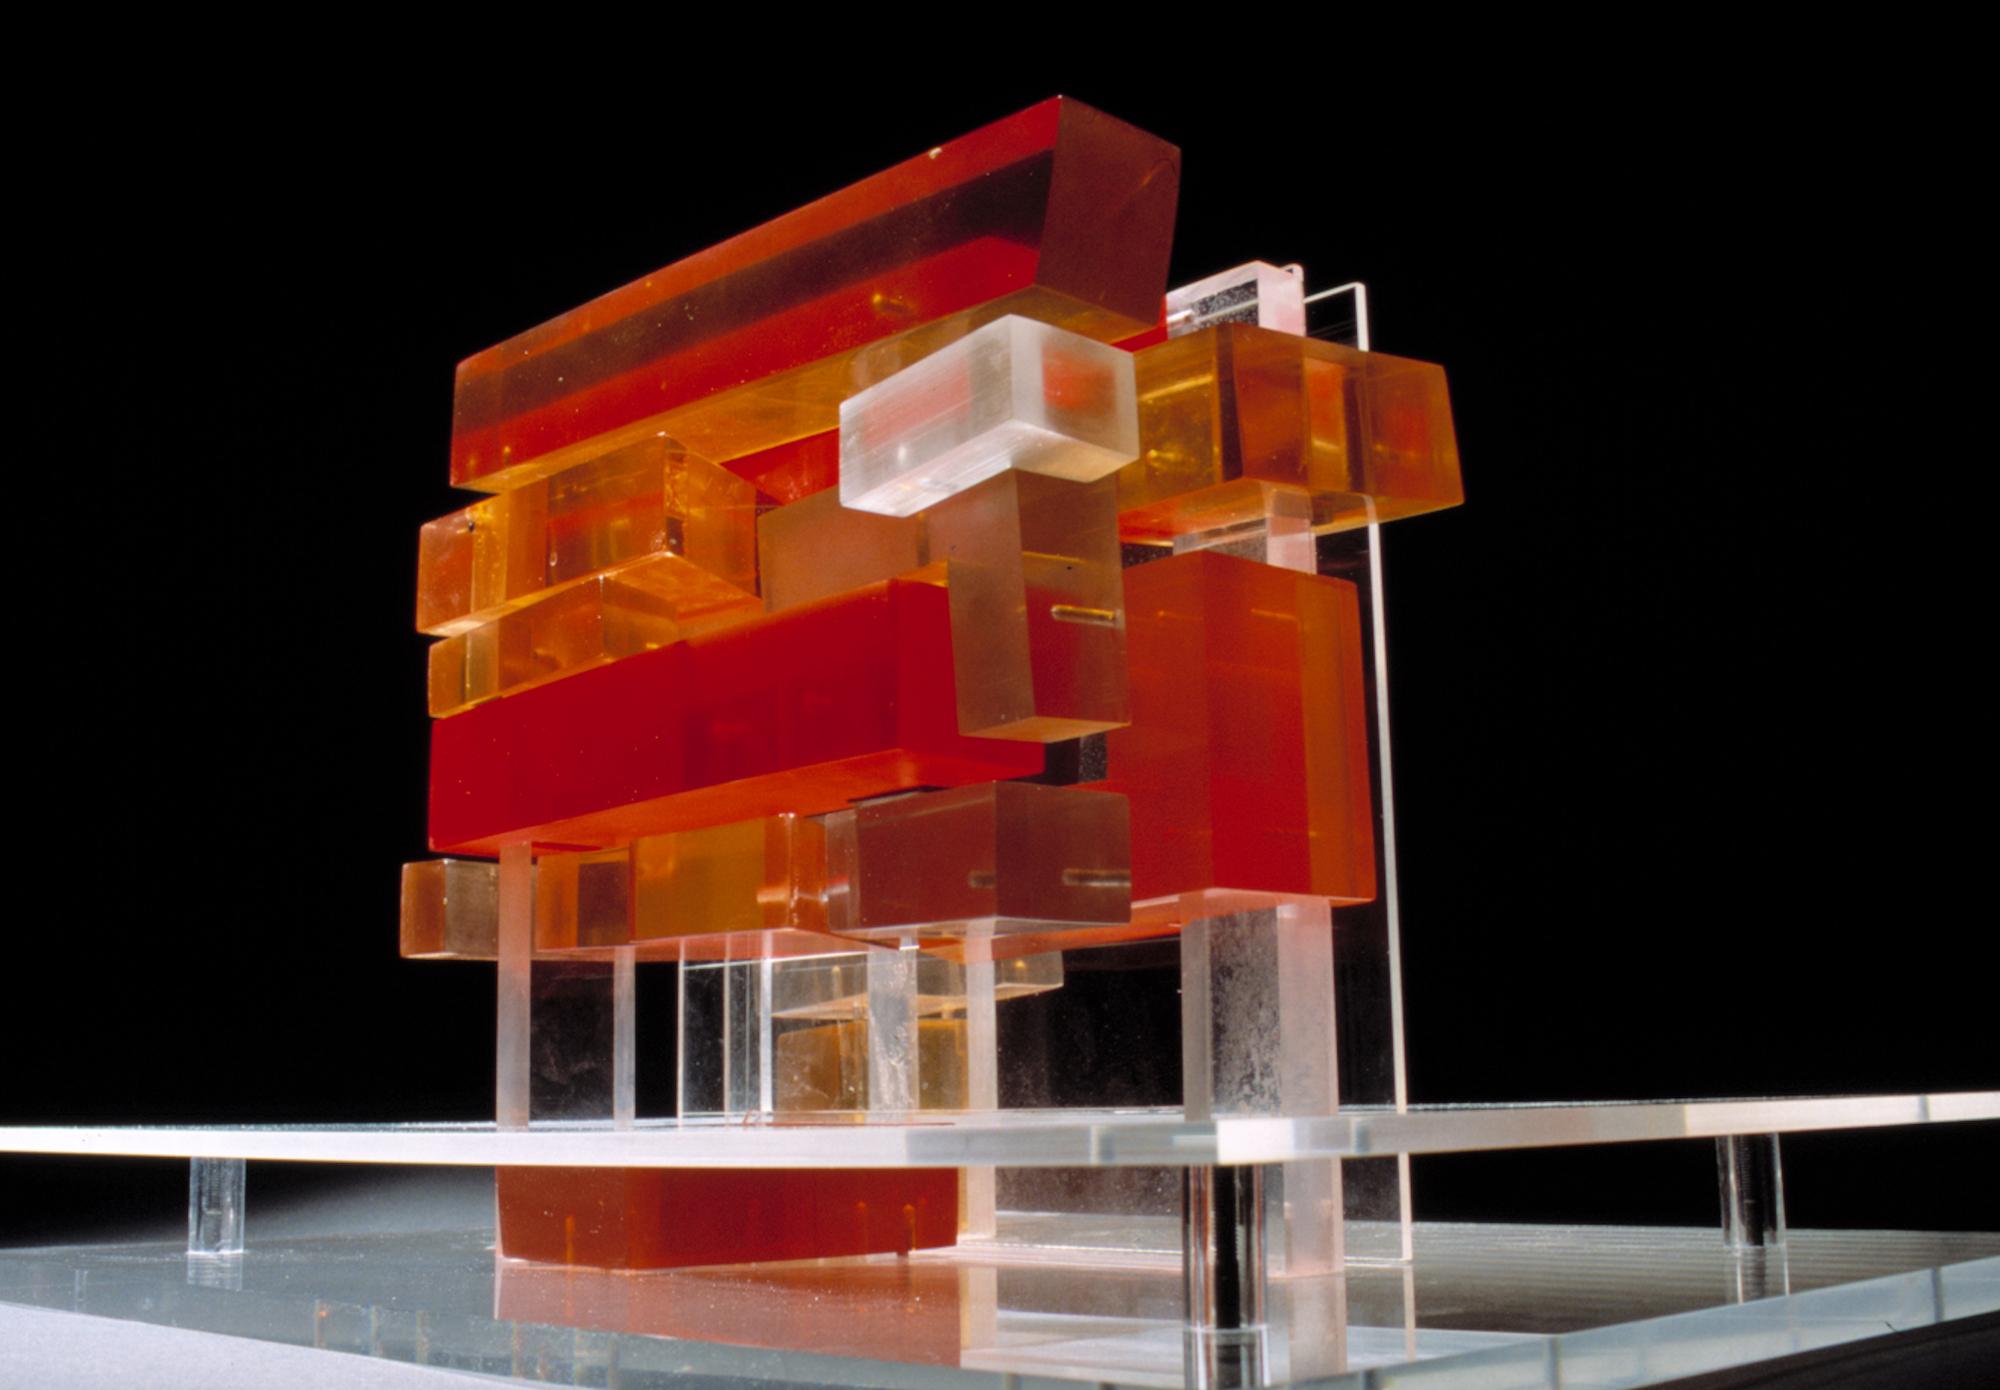 images?q=tbn:ANd9GcQh_l3eQ5xwiPy07kGEXjmjgmBKBRB7H2mRxCGhv1tFWg5c_mWT Ideas For Center For Contemporary Art Cincinnati @koolgadgetz.com.info